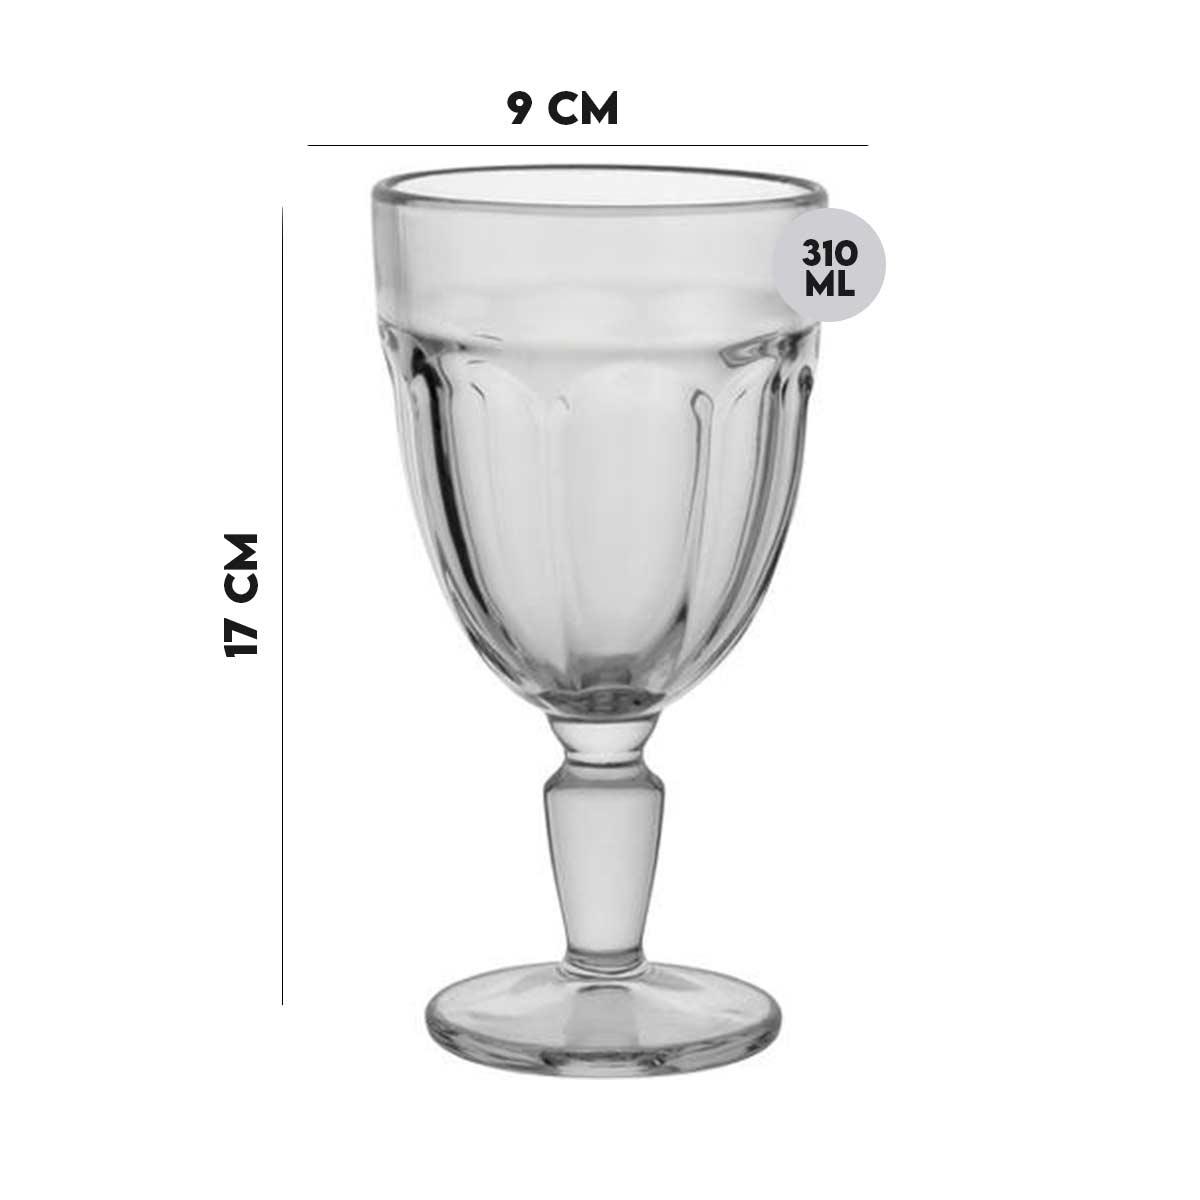 Jogo 4 Taças de Vidro Transparente Gavin 310 ml  - Lemis